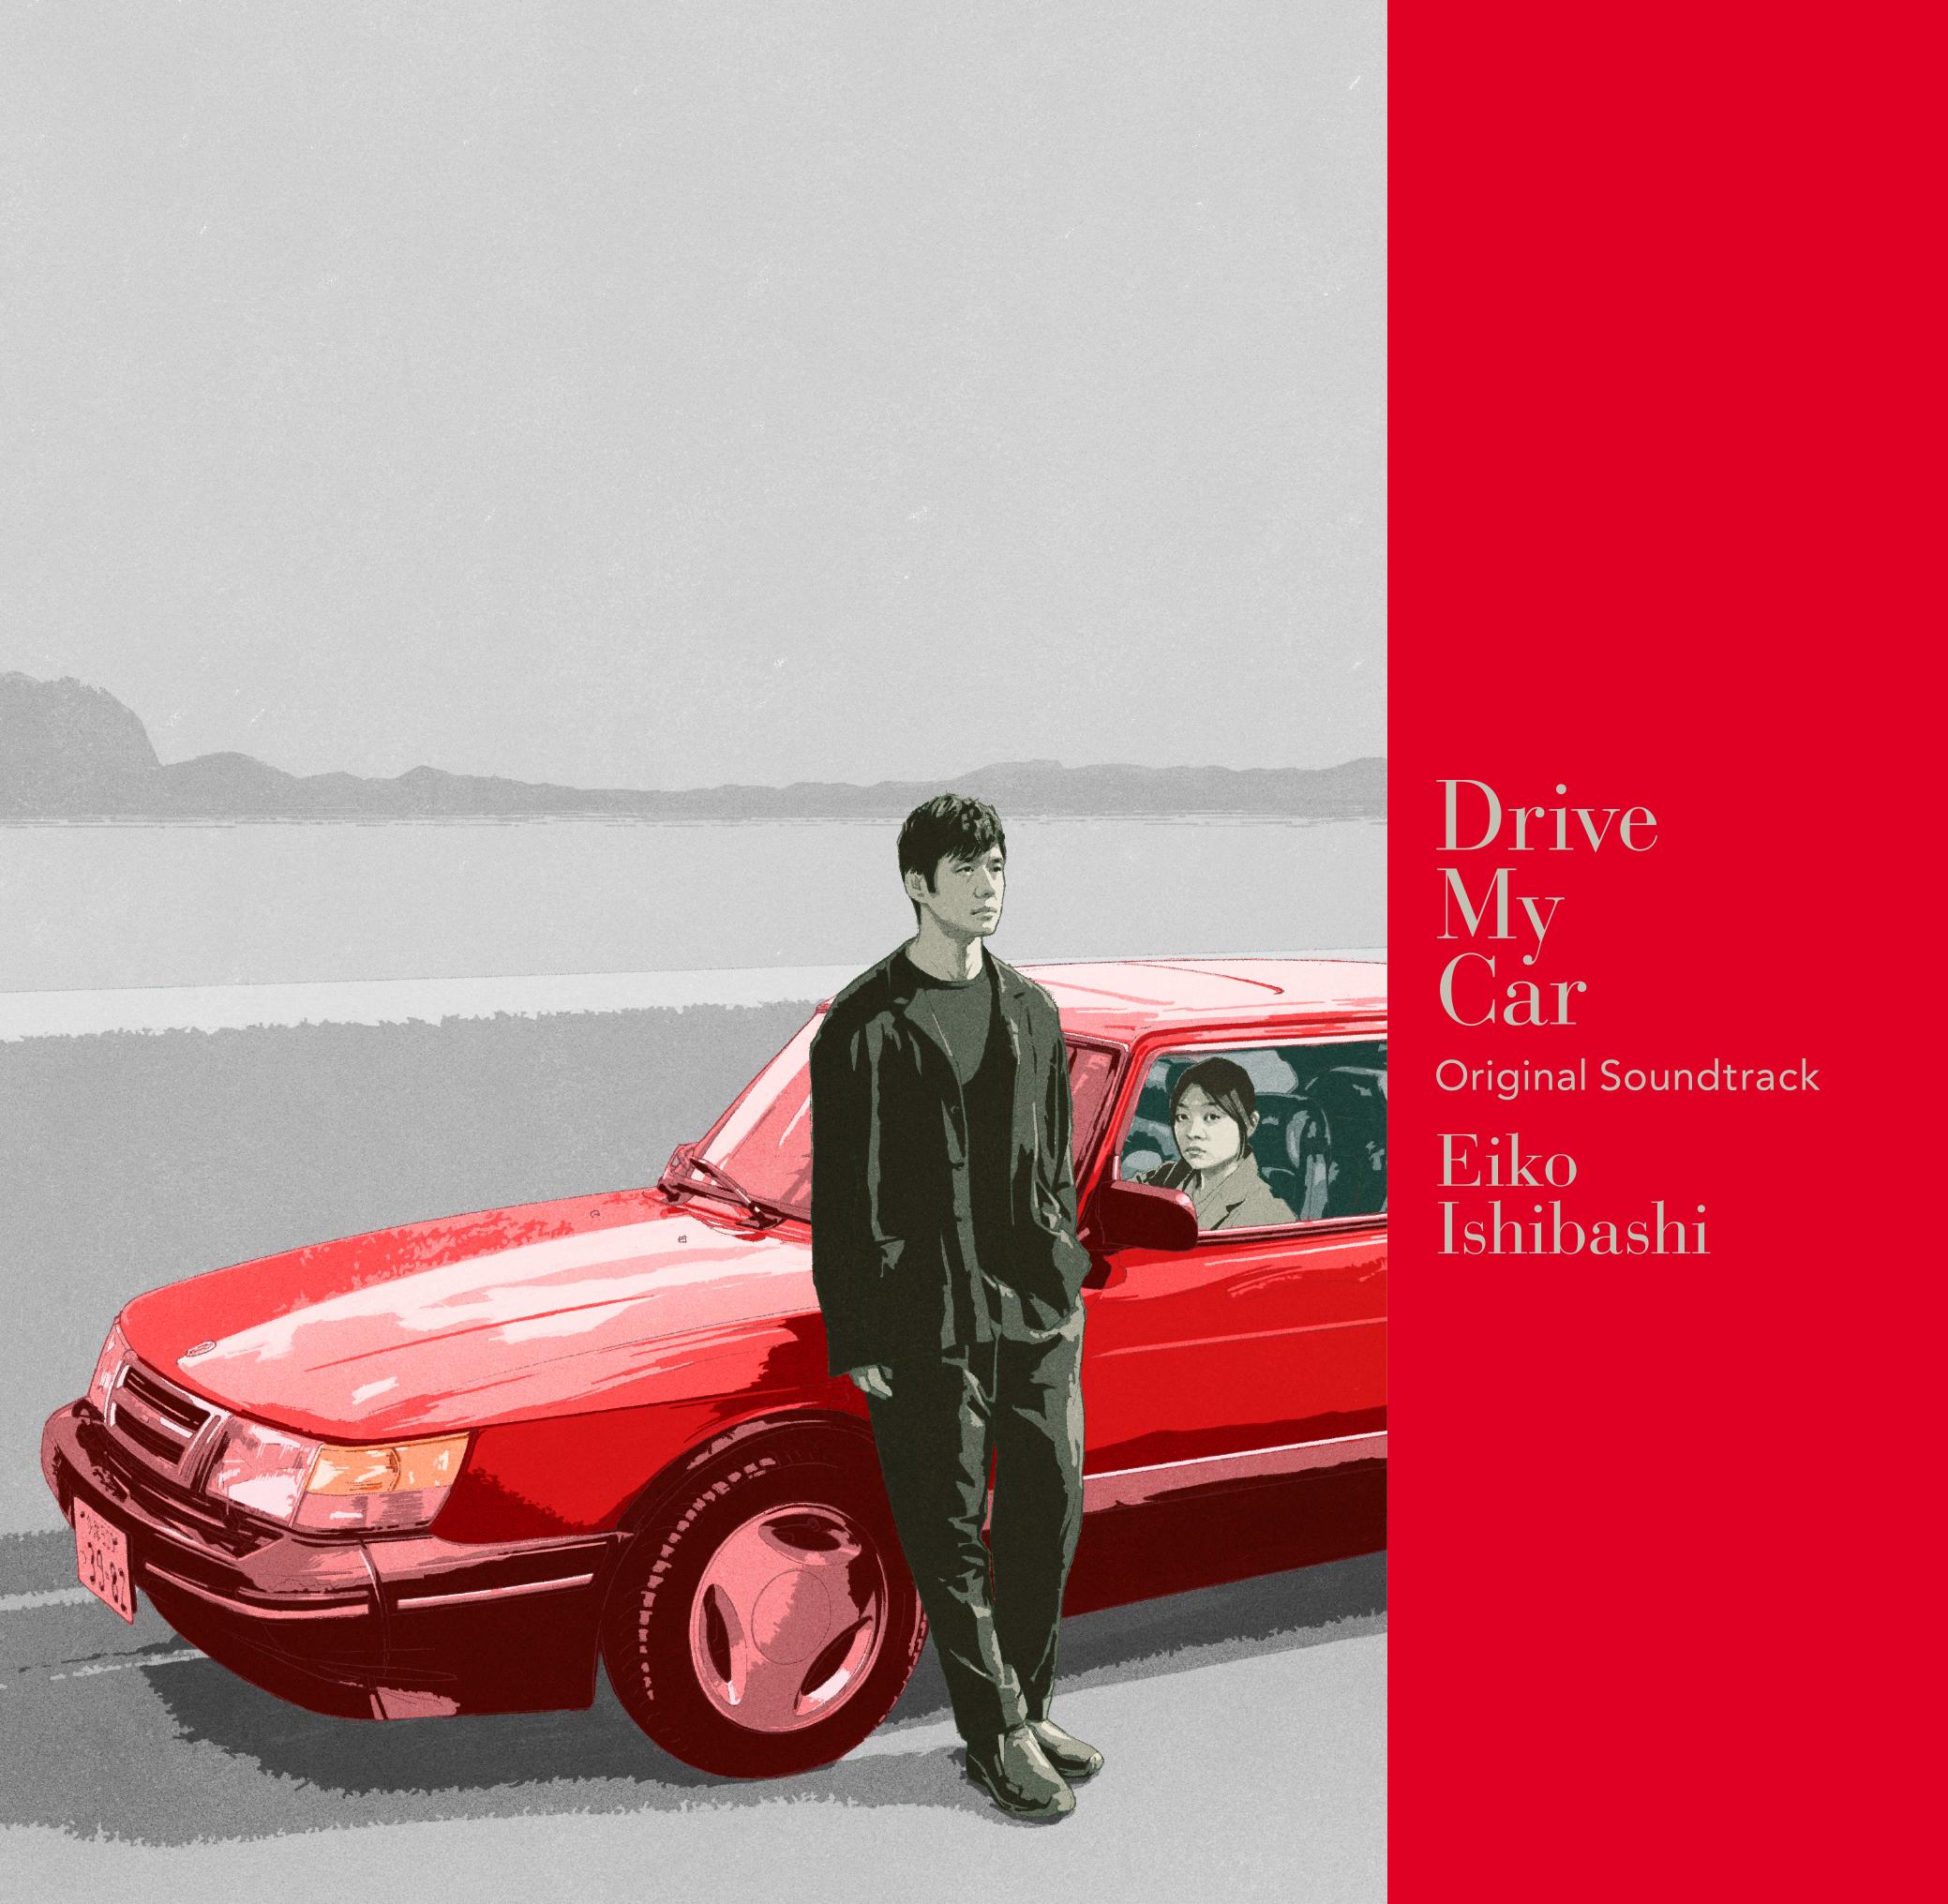 石橋英子『Drive My Car Original Soundtrack』